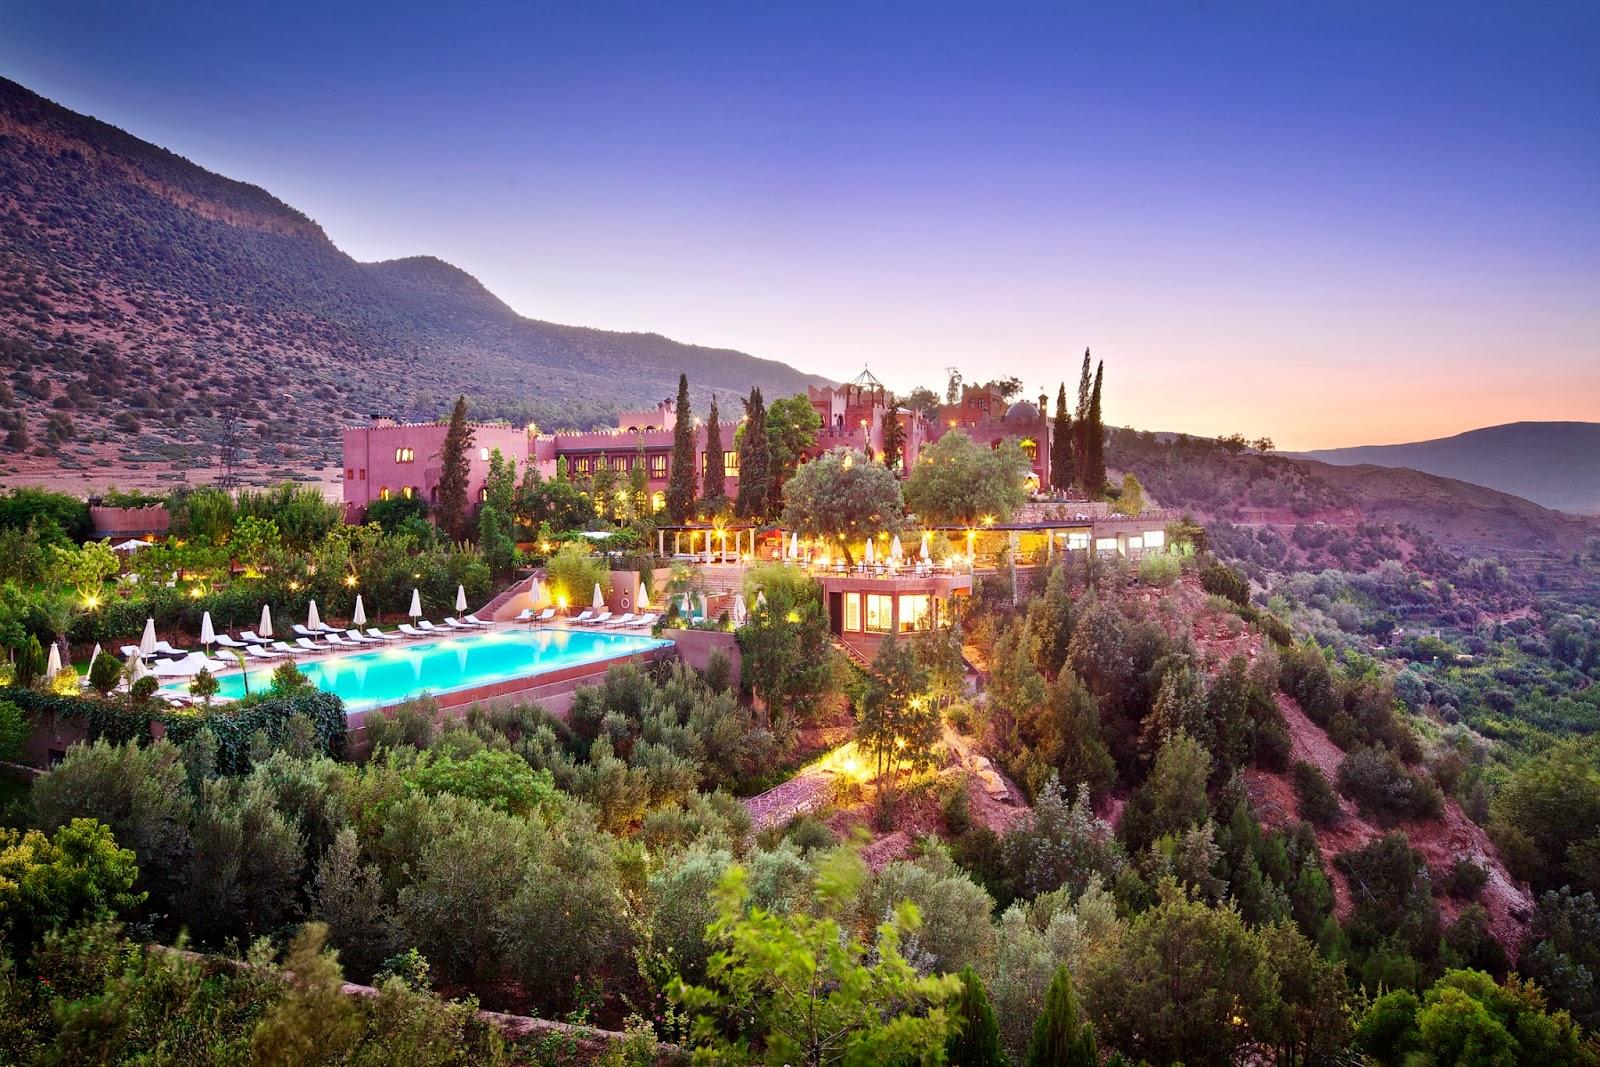 Hotel in Marokko - Kasbah Tamadot - Ritz Reisen